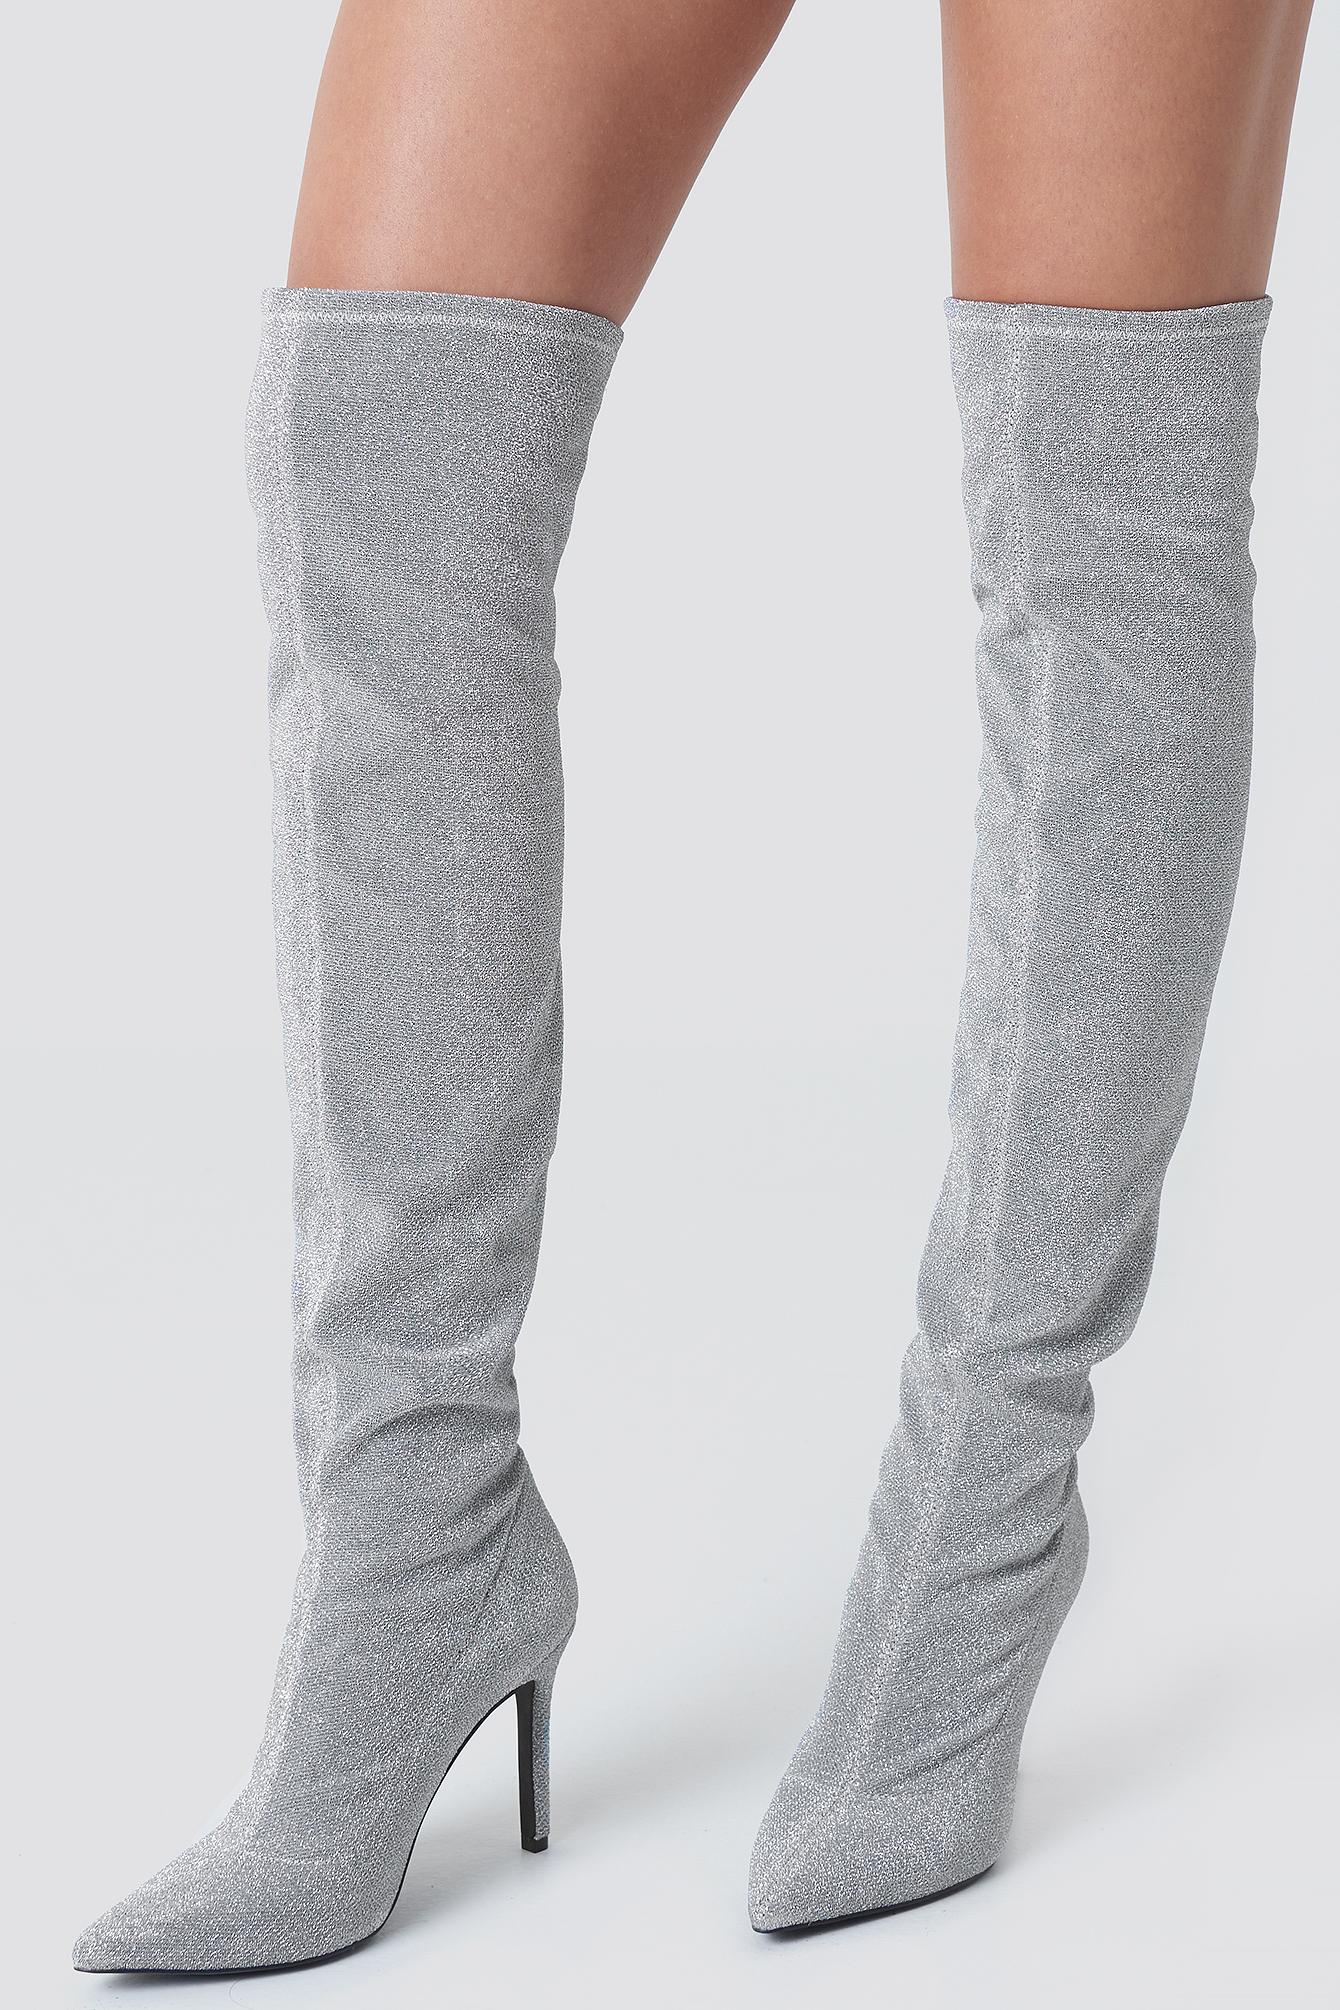 sahara ray x na-kd -  Lurex Overknee Boots - Silver